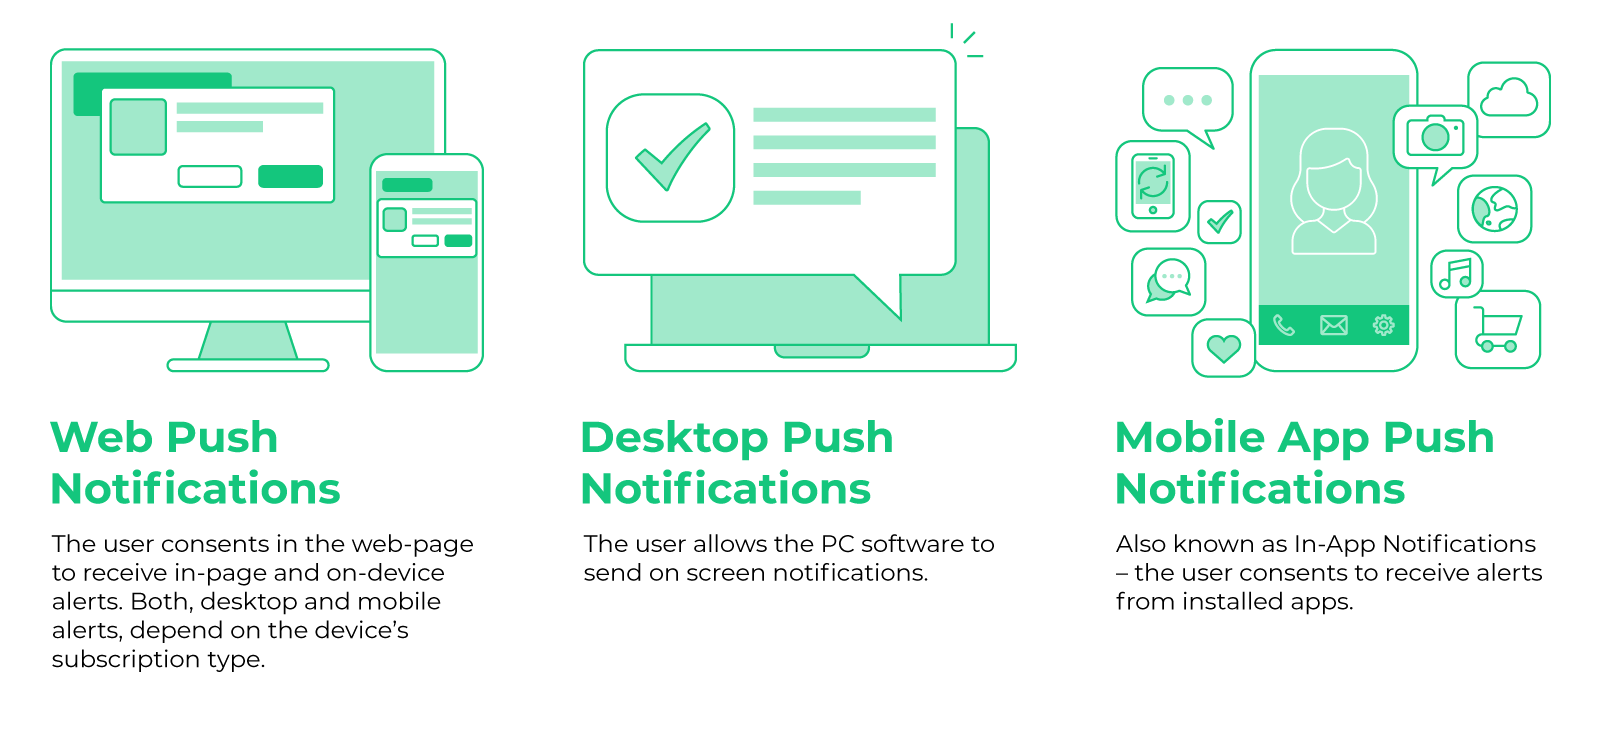 3 types of Push Notifications